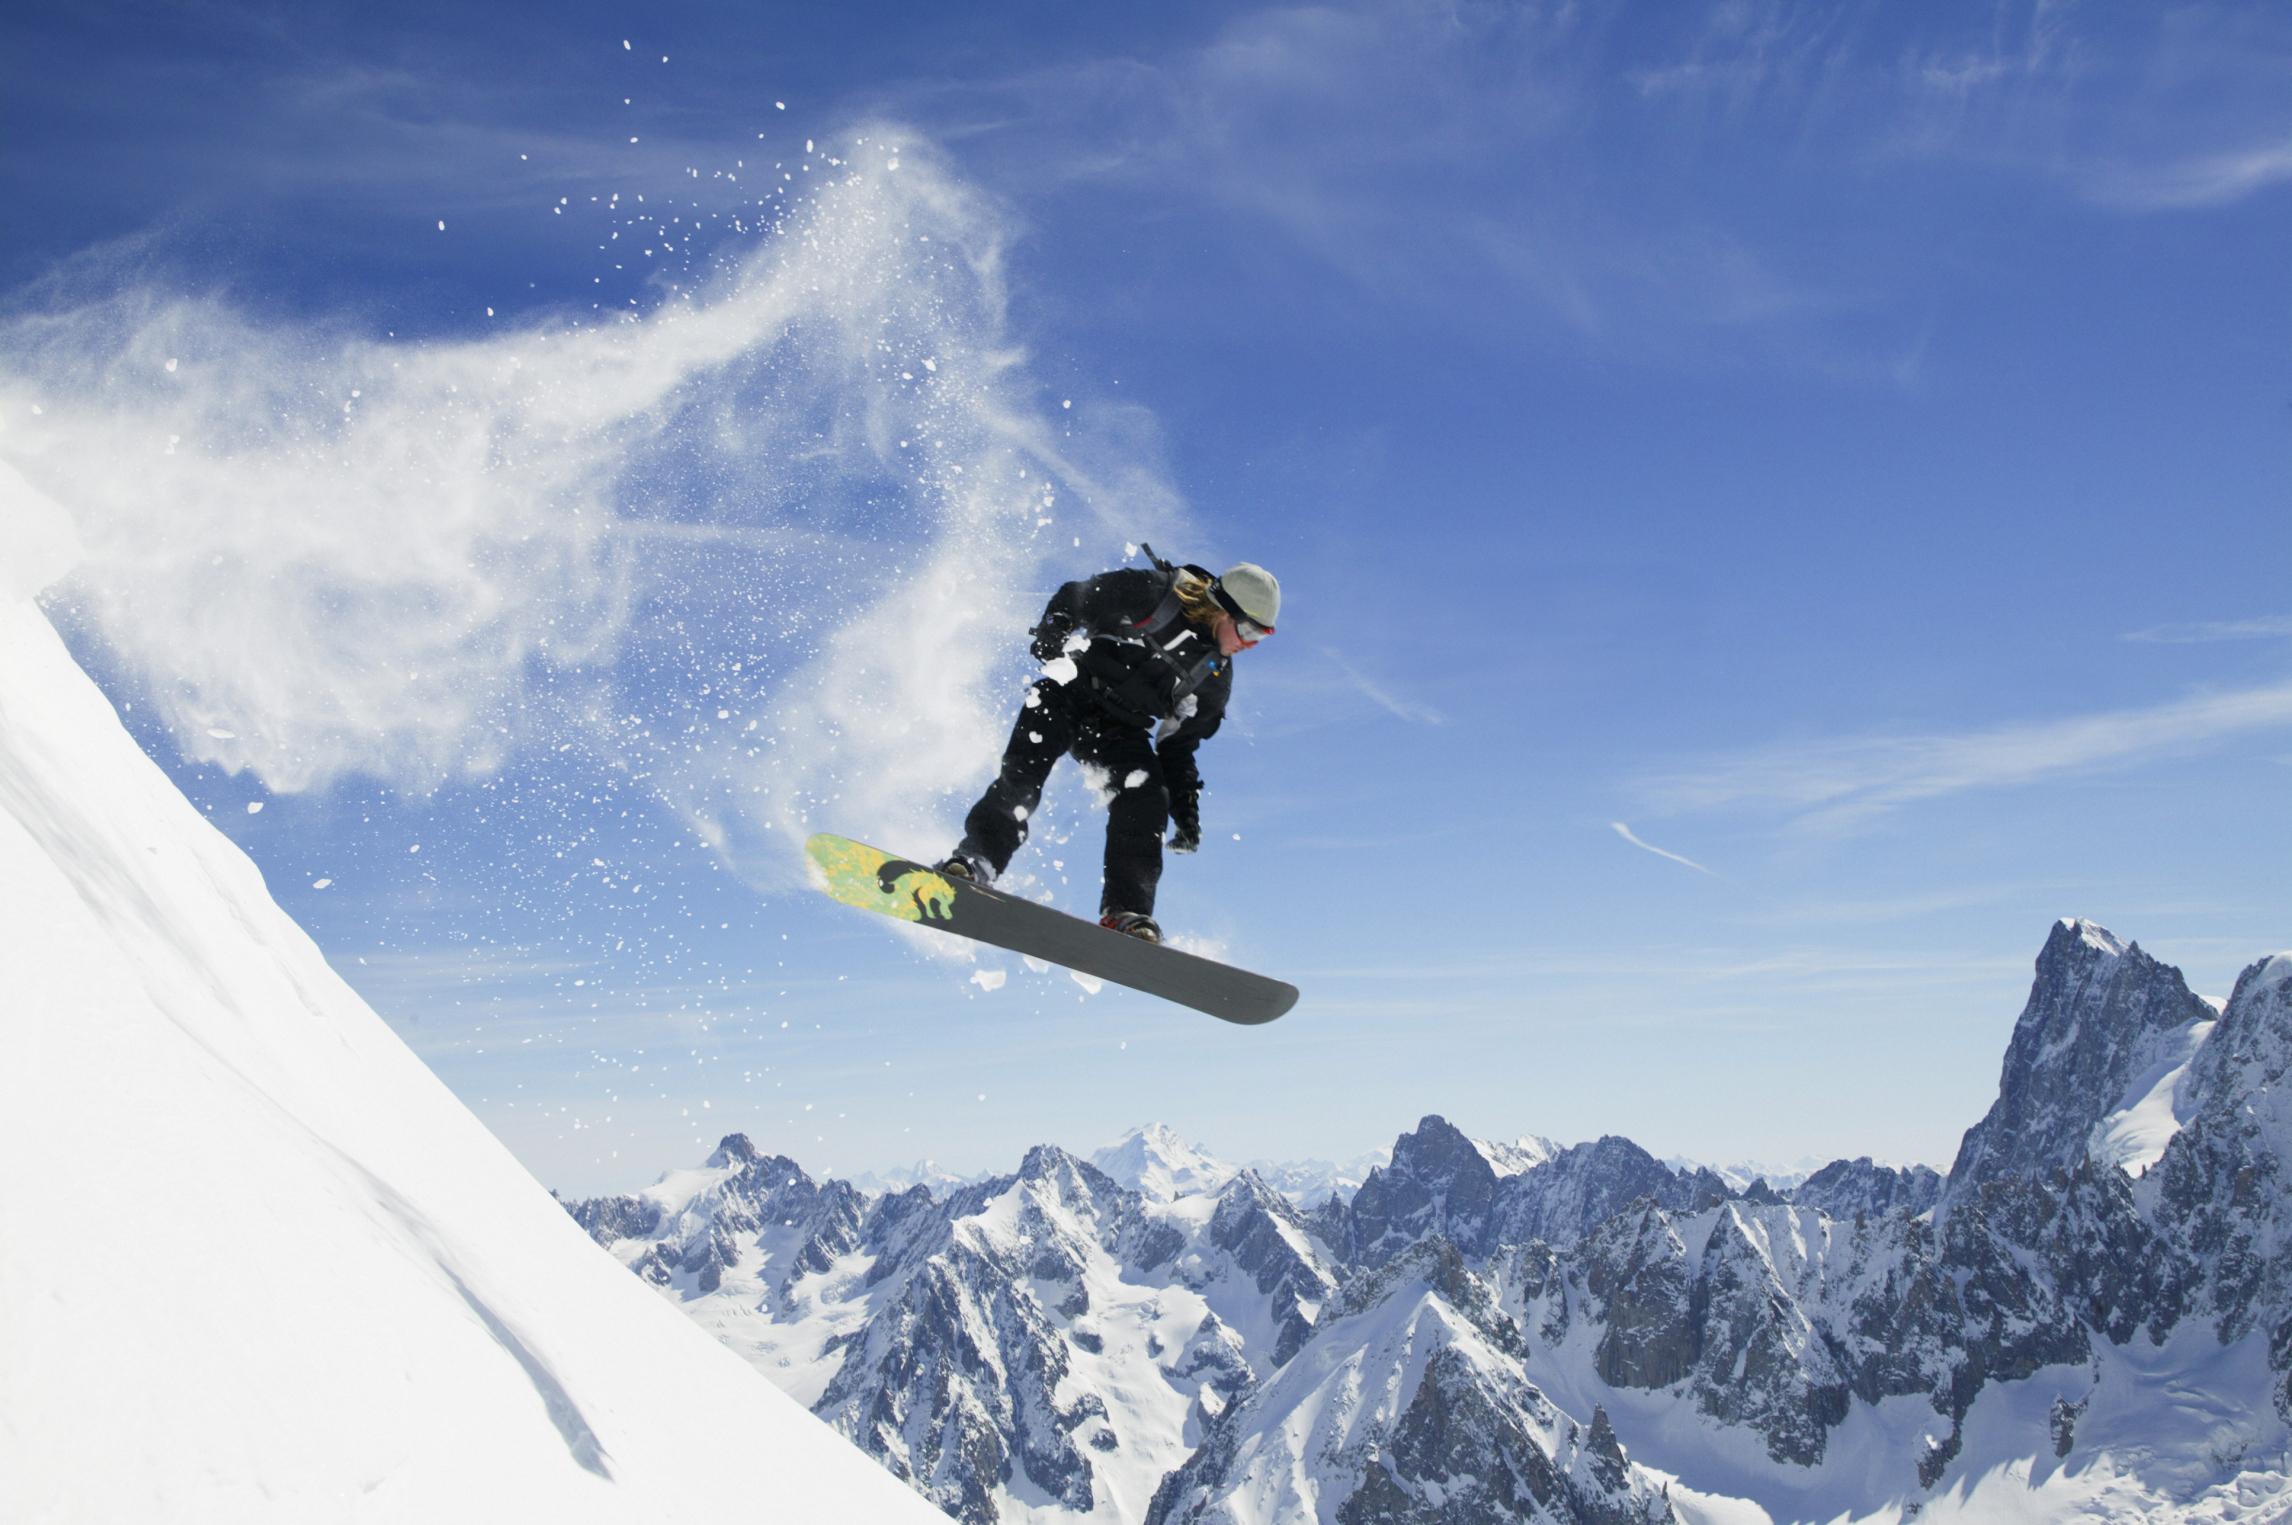 Wallpaper Desktop Girl Falling Calories Burned While Snowboarding Healthfully